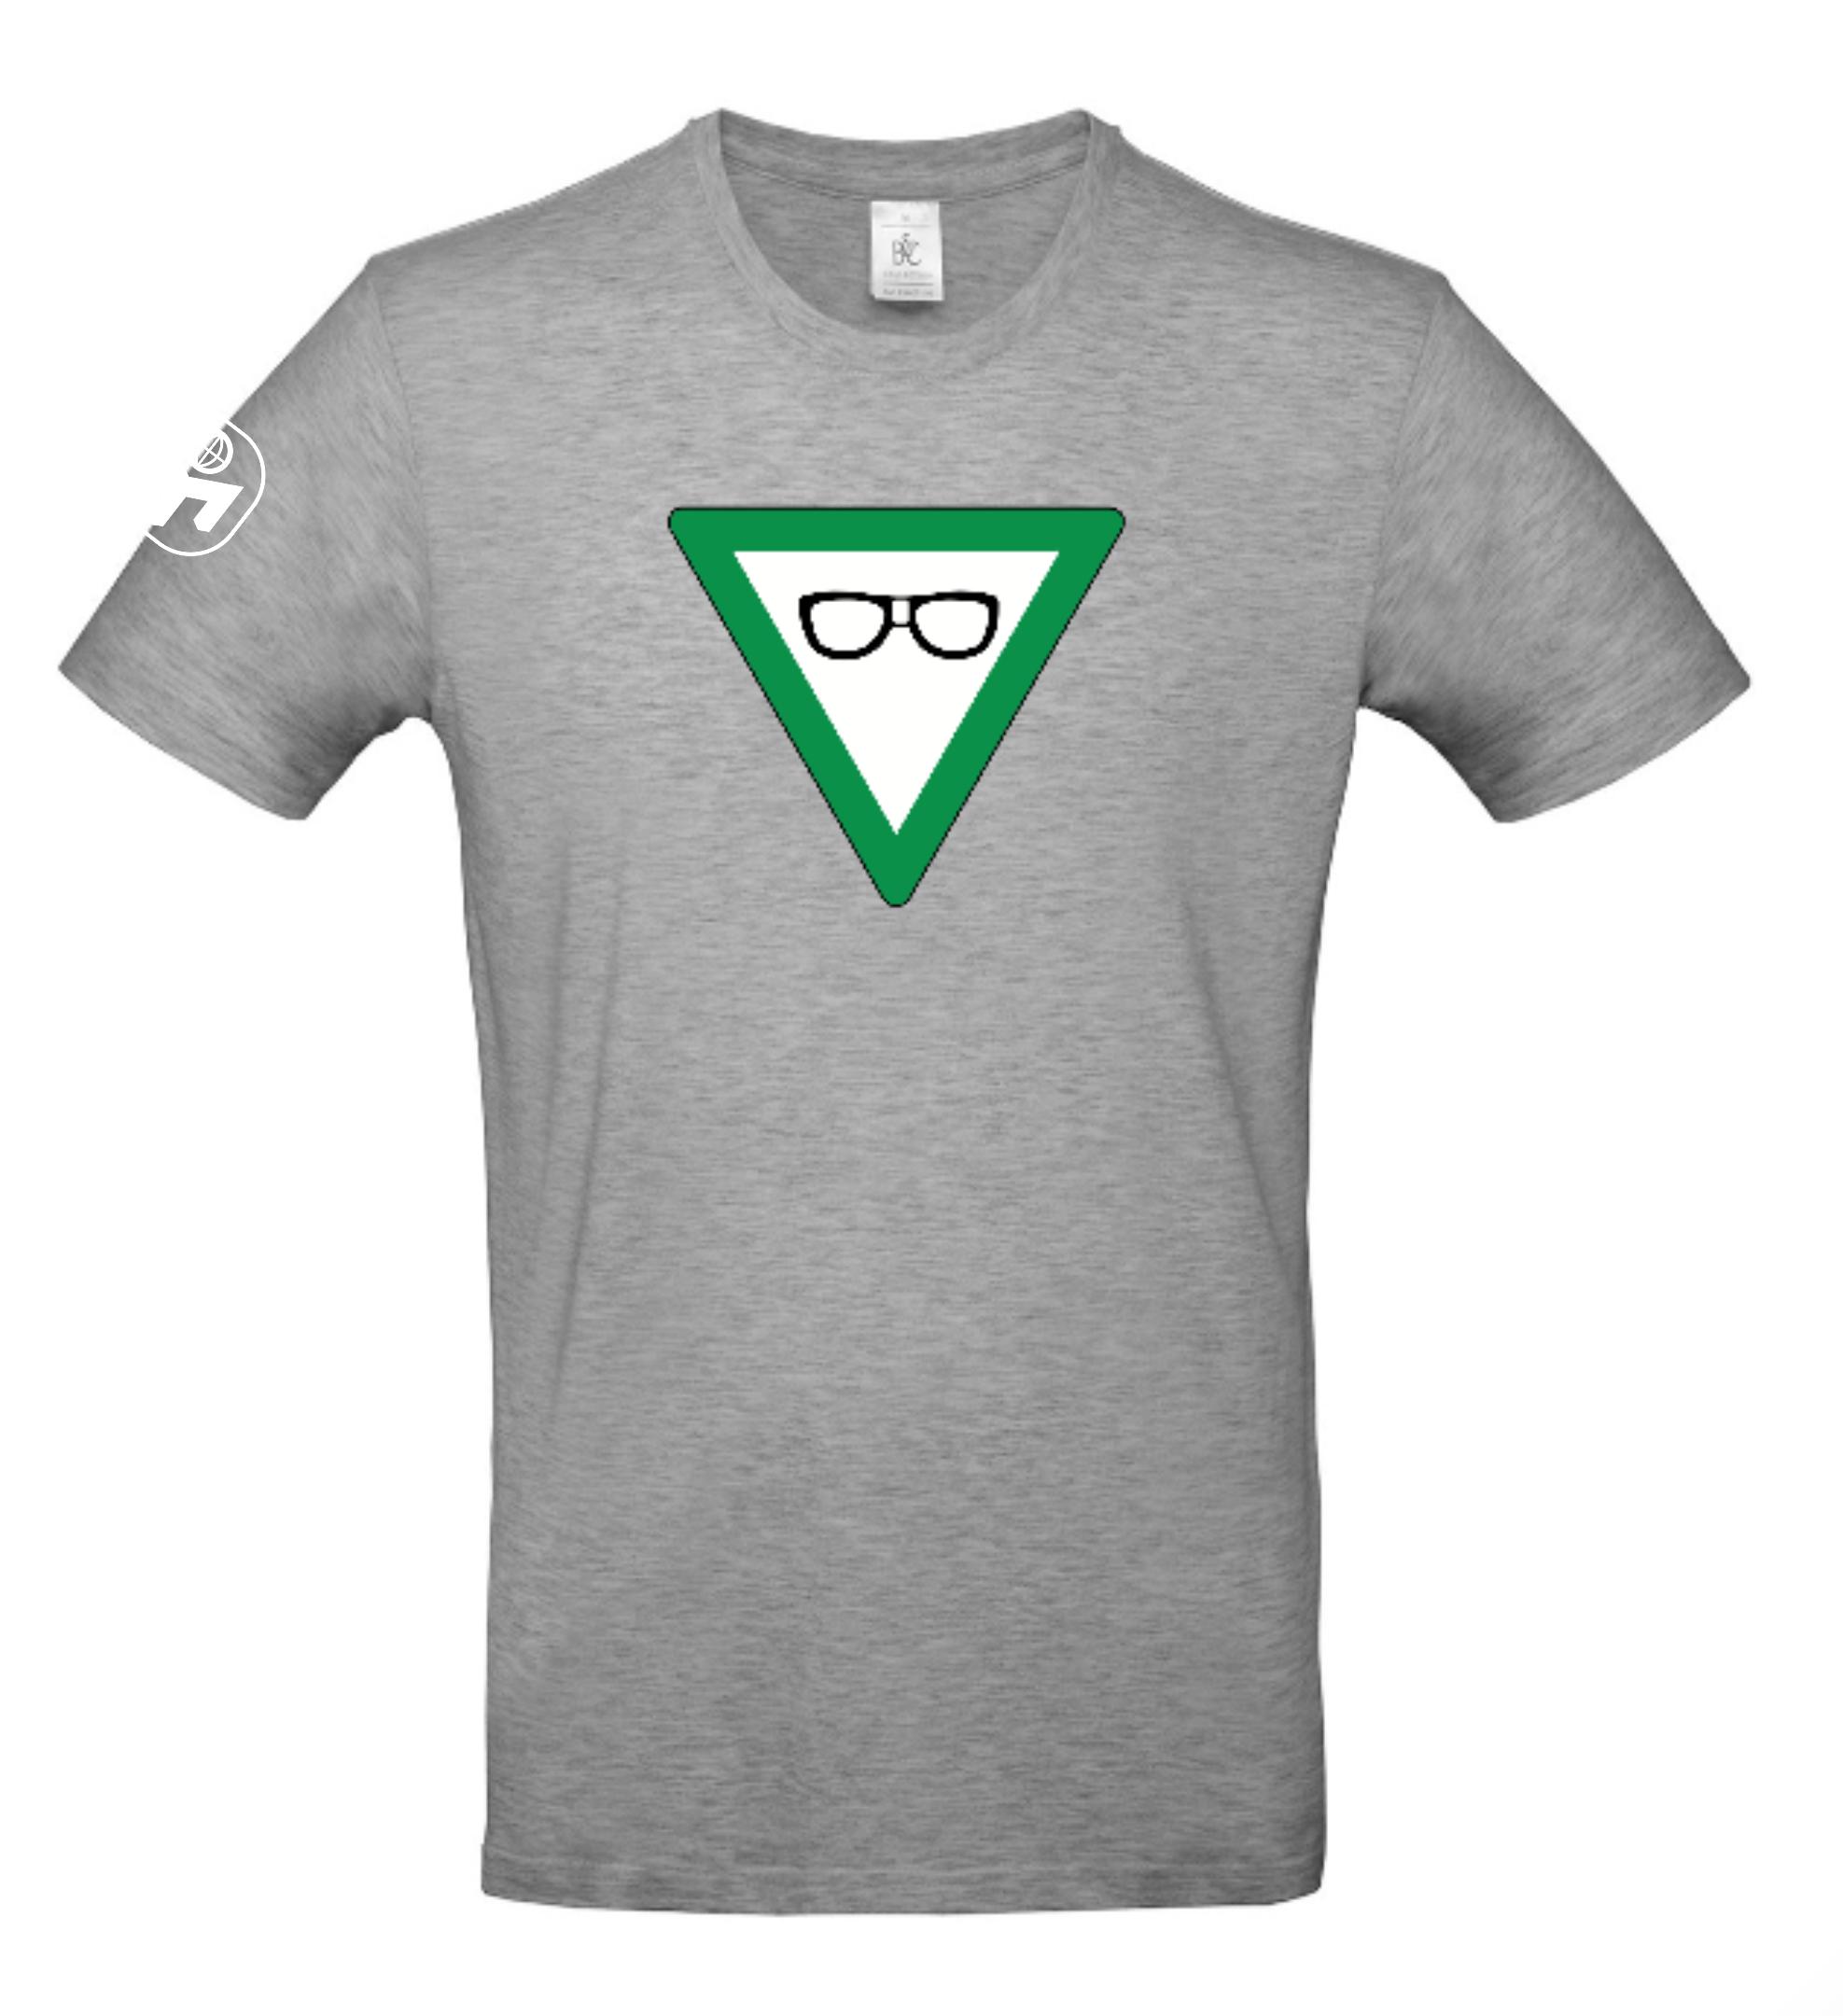 "T-Shirt Herren ""Nerdschutz"" Standard"